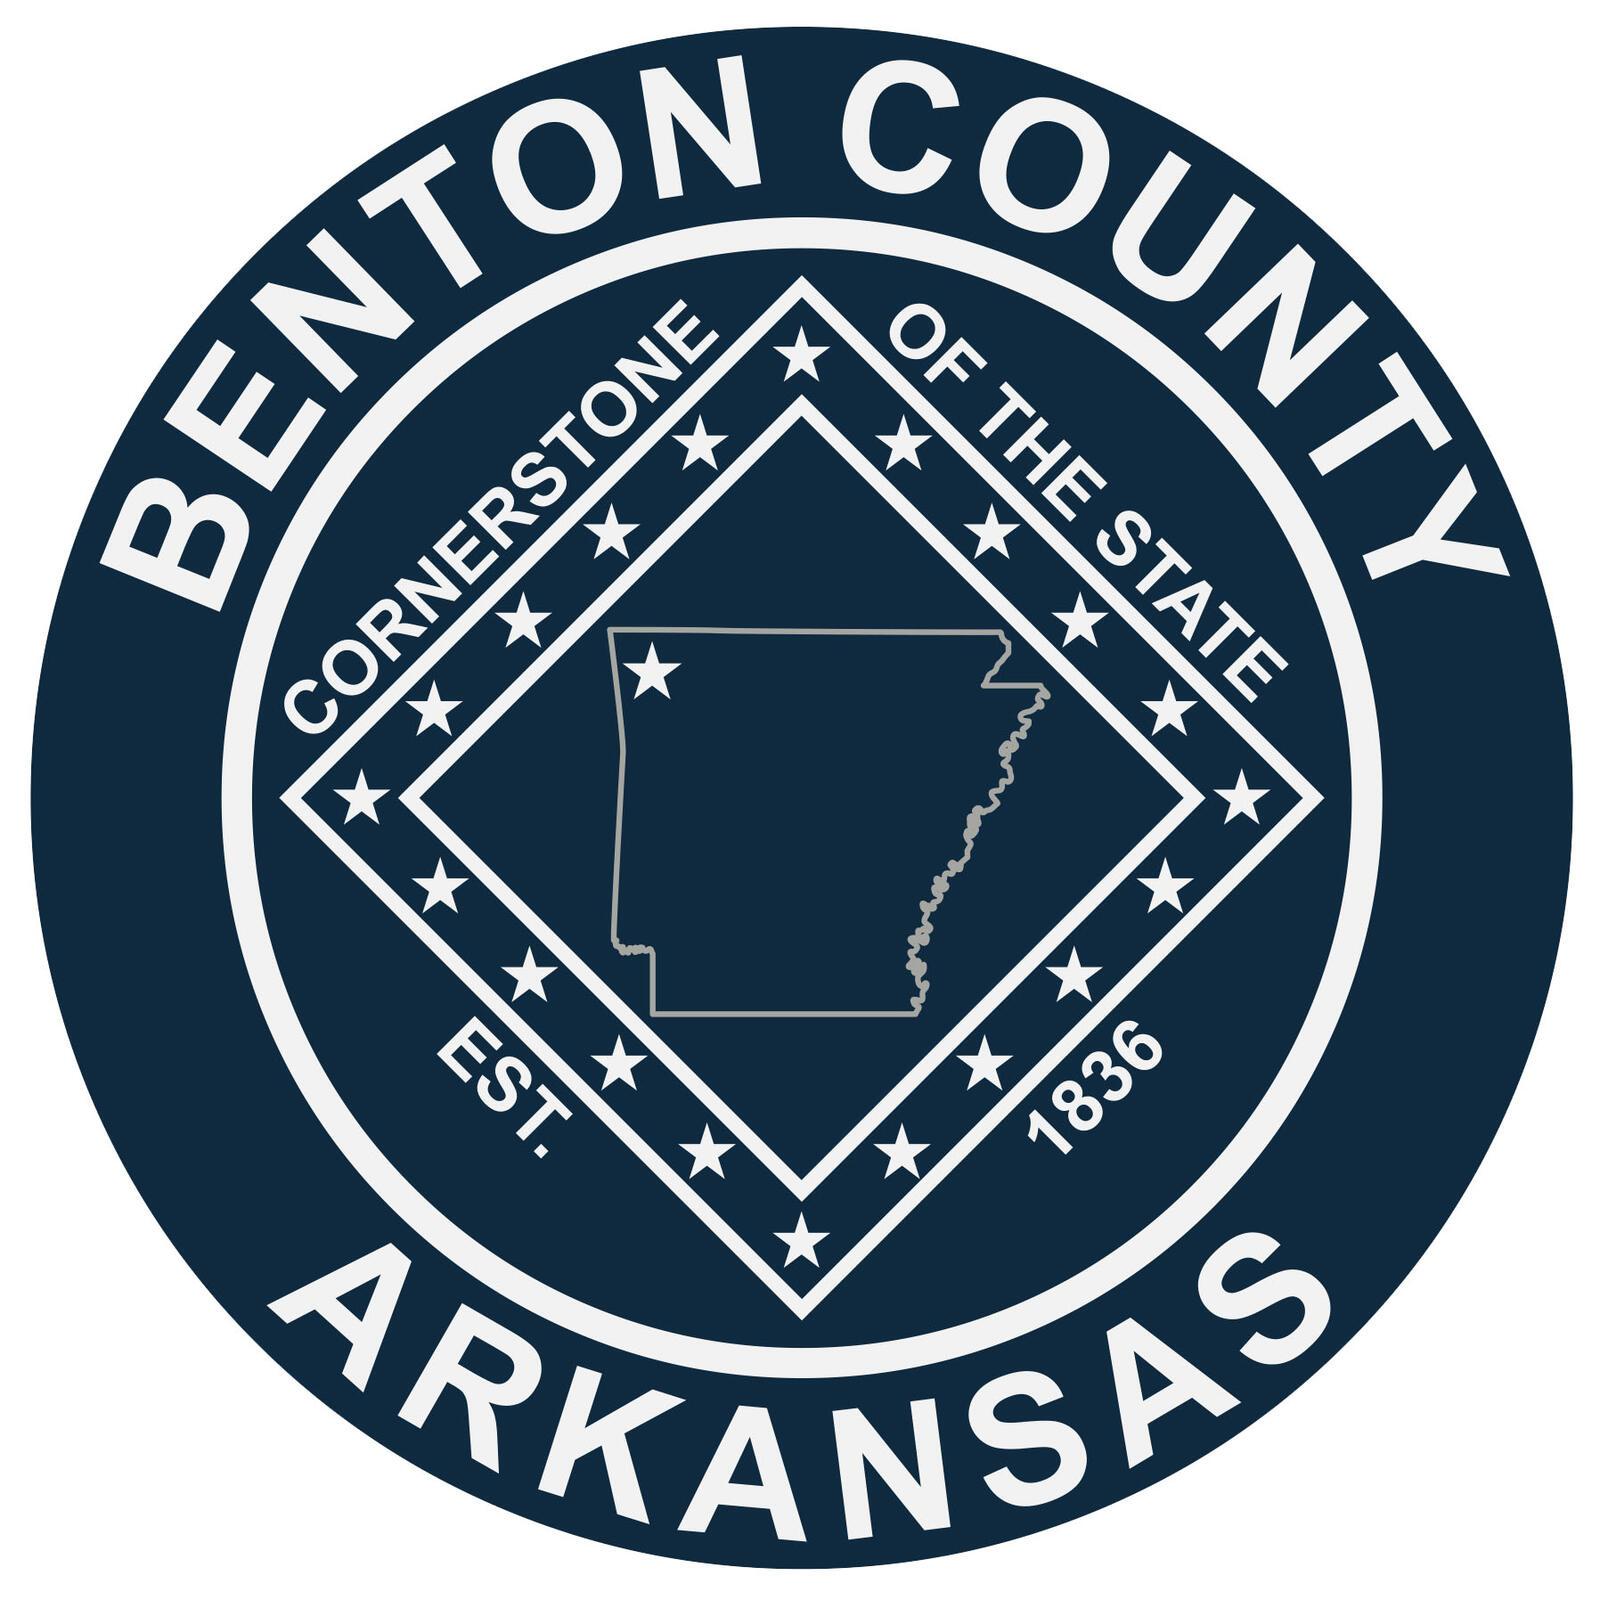 Benton County - 89 updates &mdash